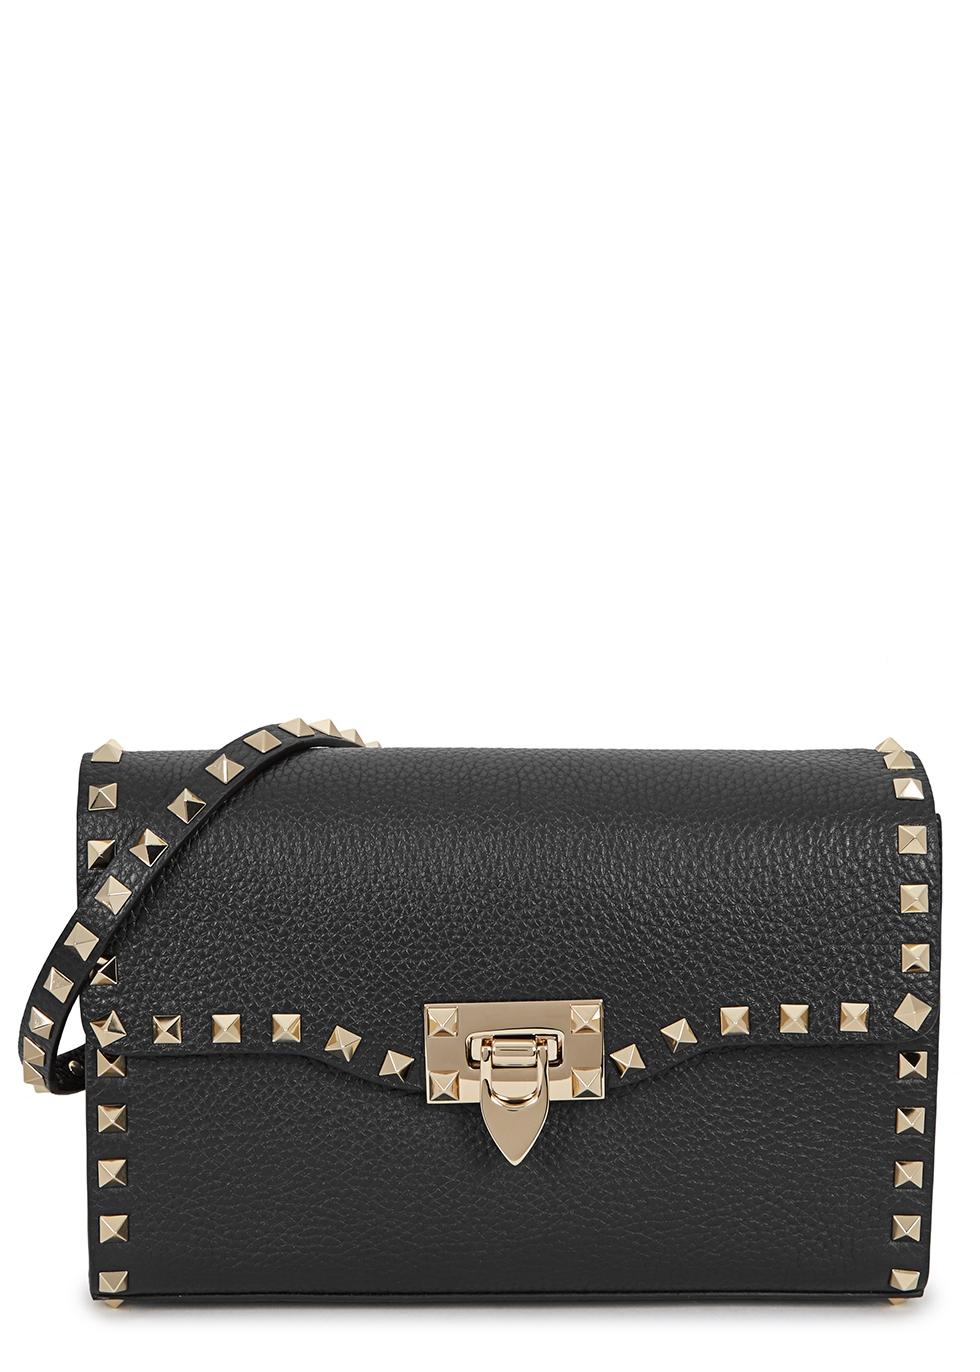 VALENTINO | Valentino Rockstud Small Black Leather Shoulder Bag | Goxip